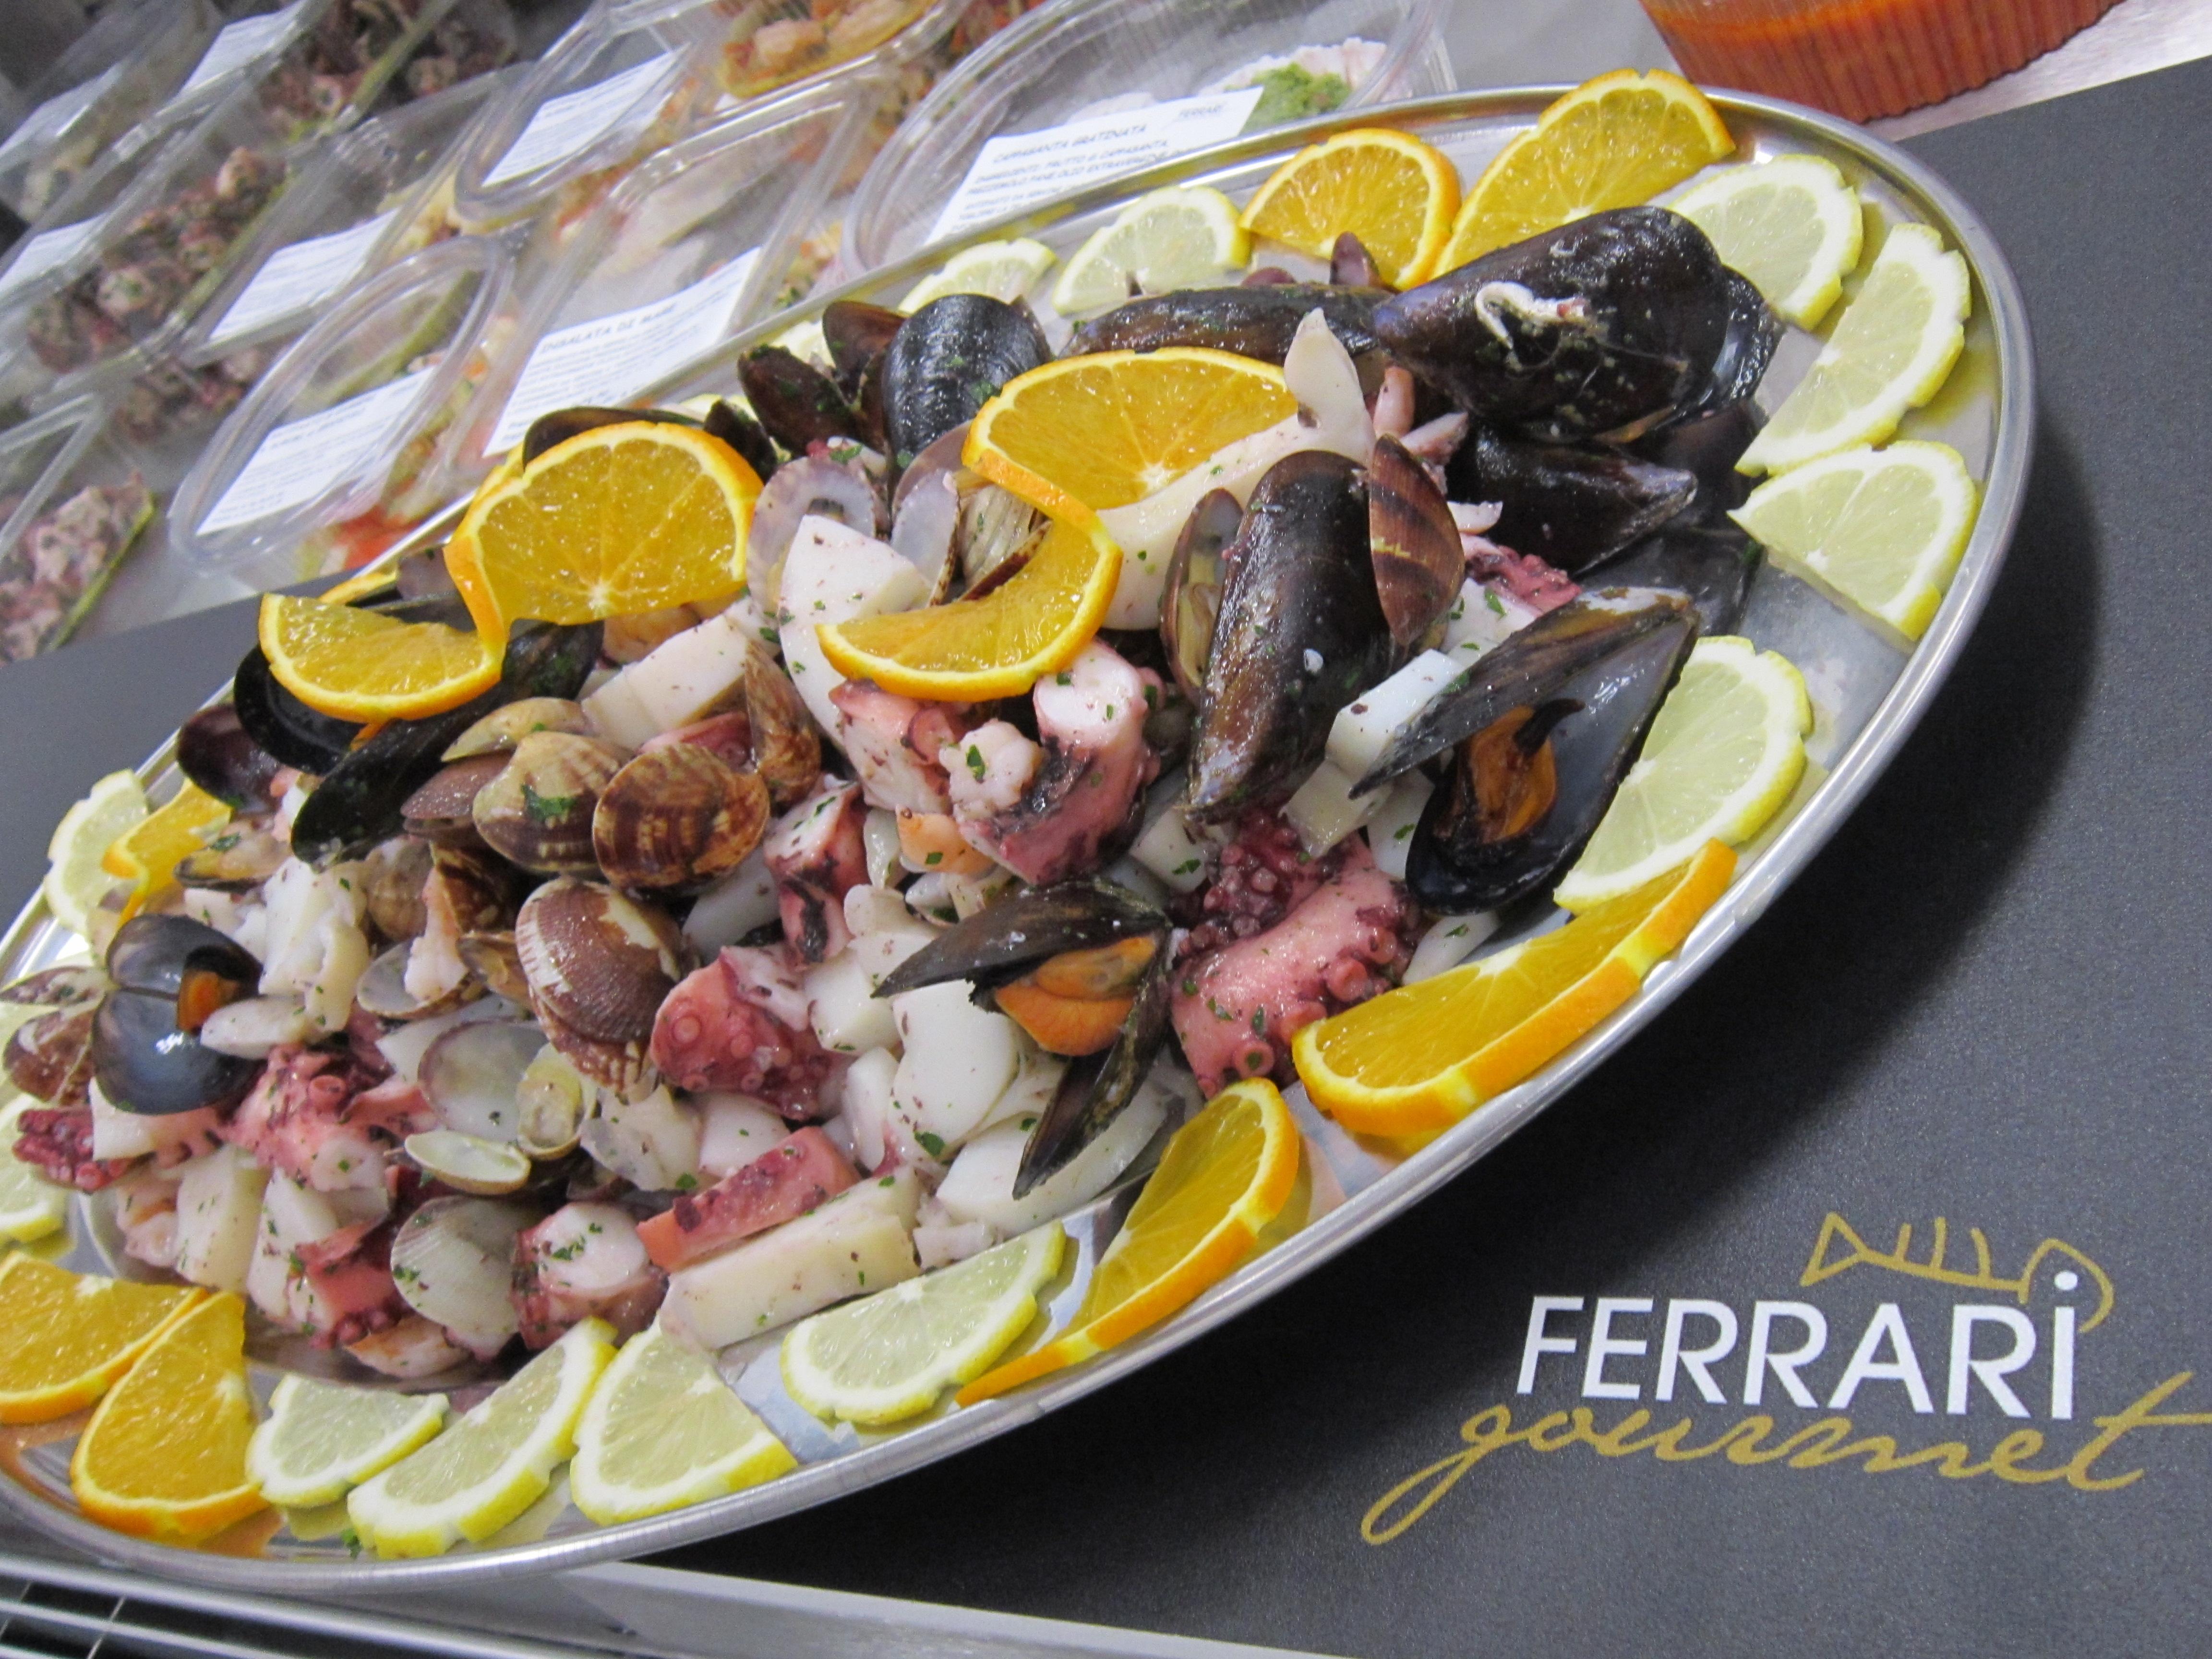 www.fiordisapori.it